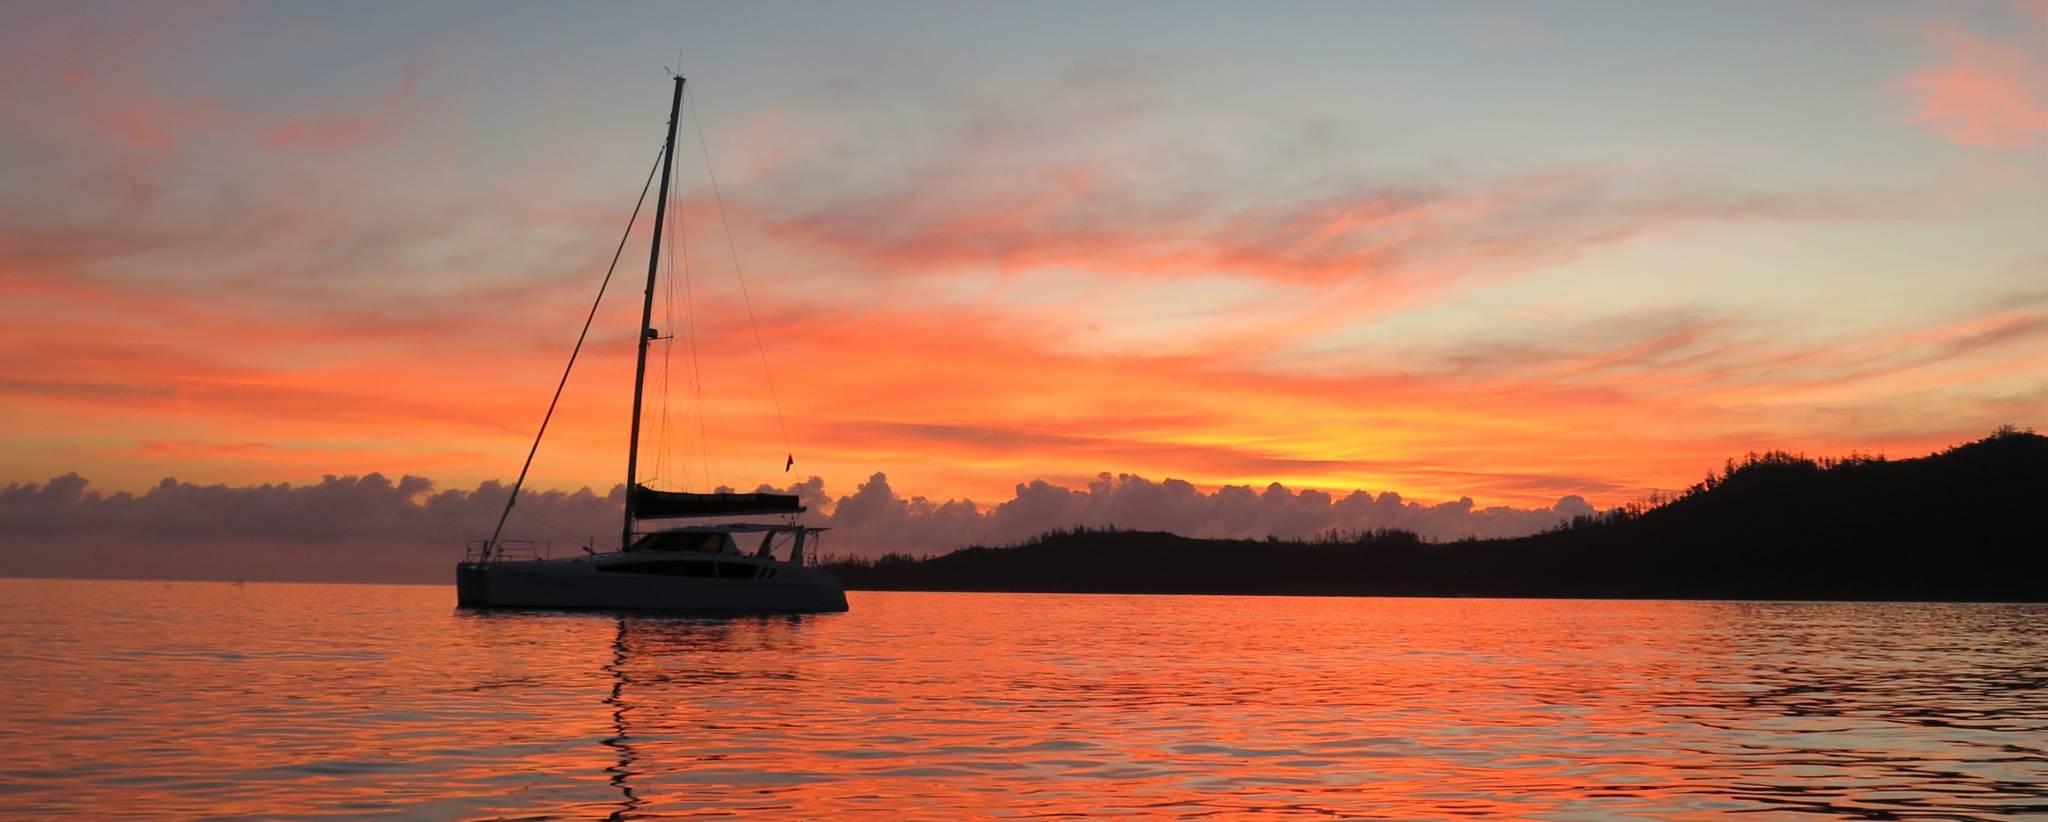 Seawind 1260 sunset sasil